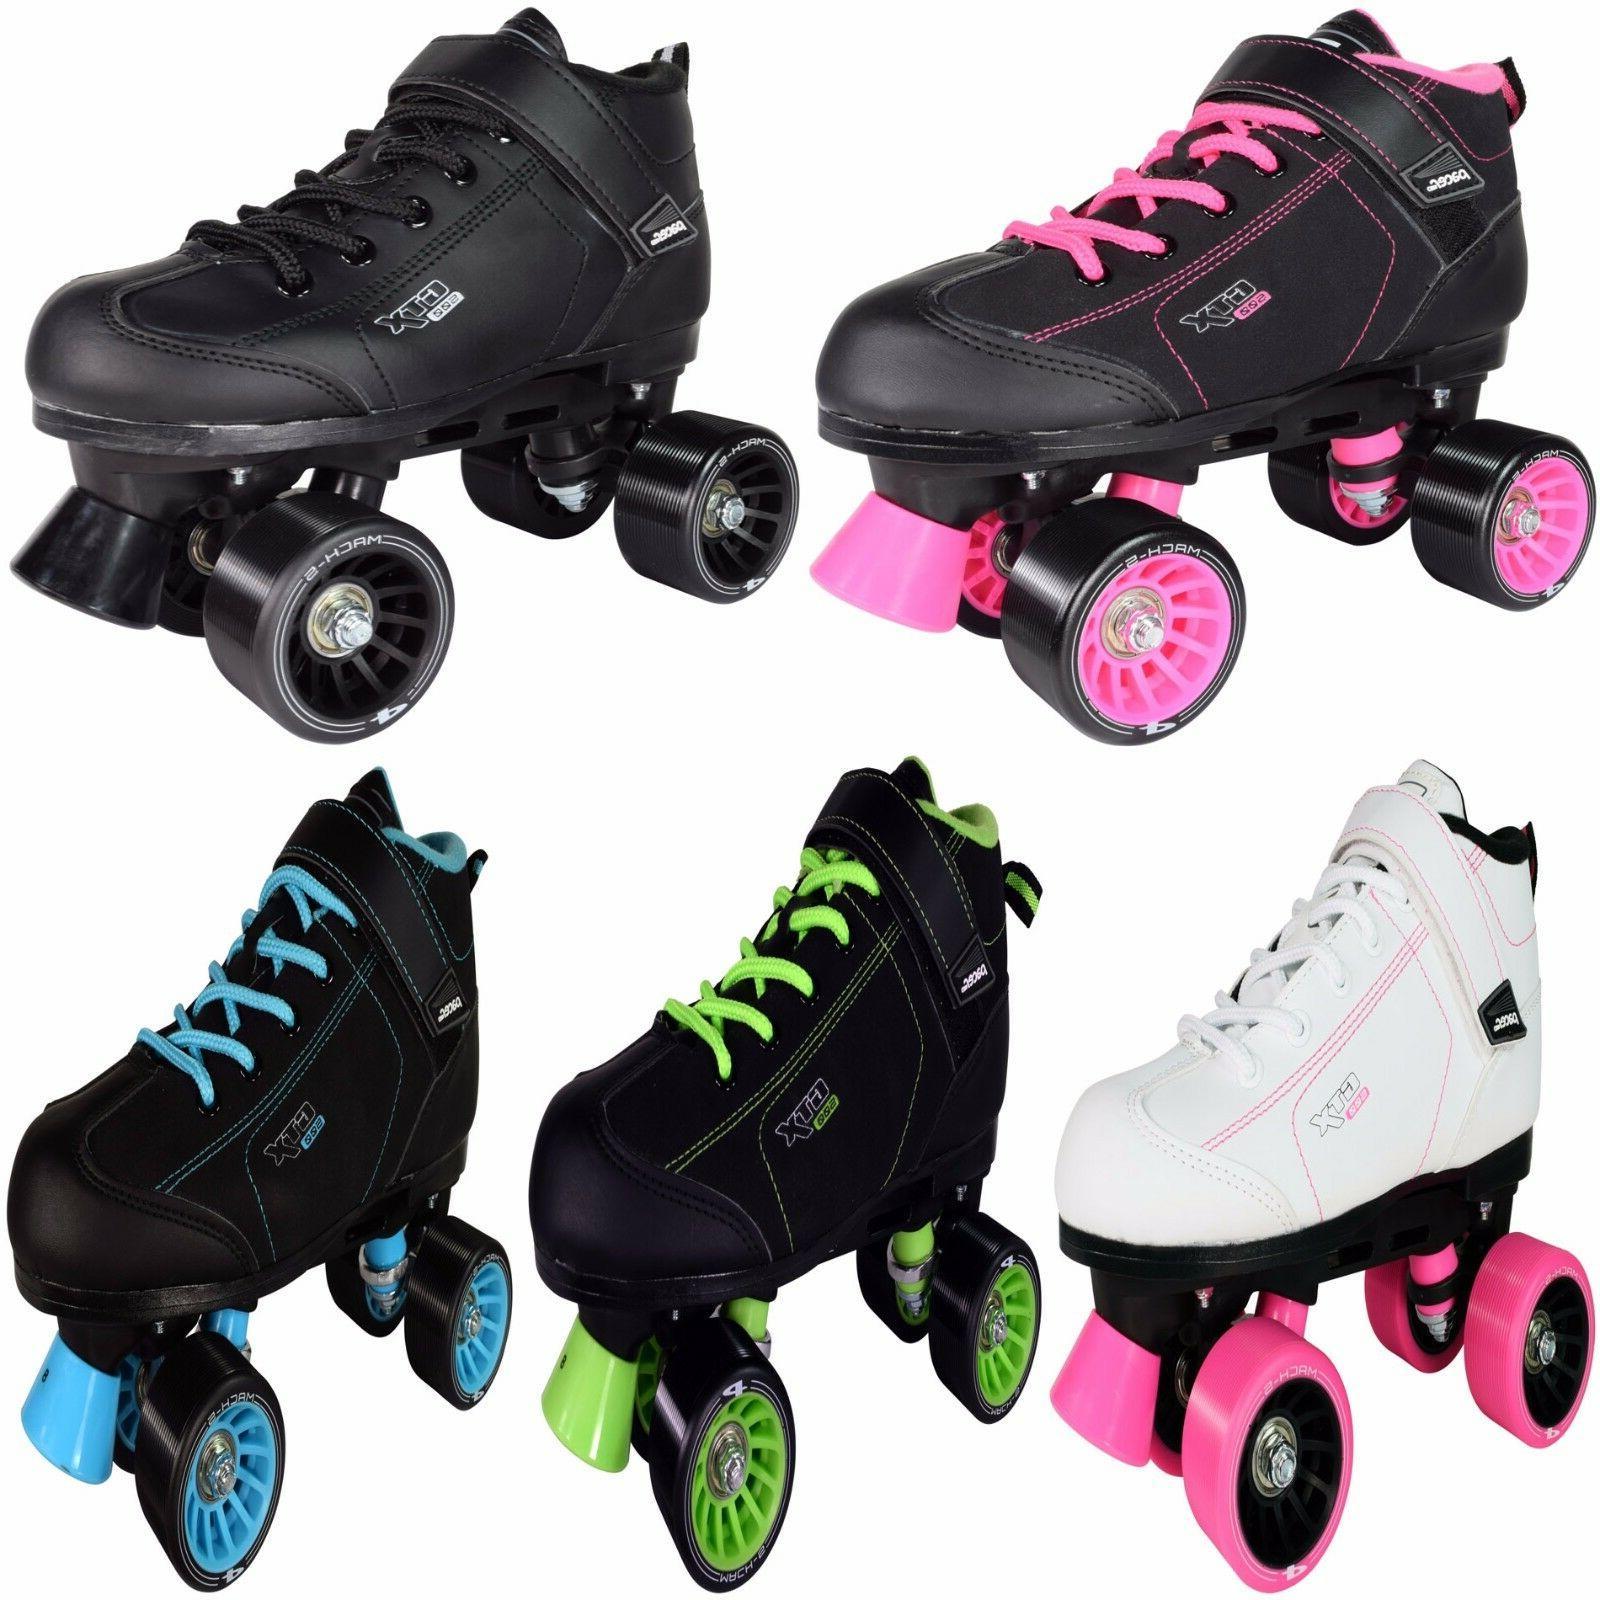 gtx 500 quad speed roller skates